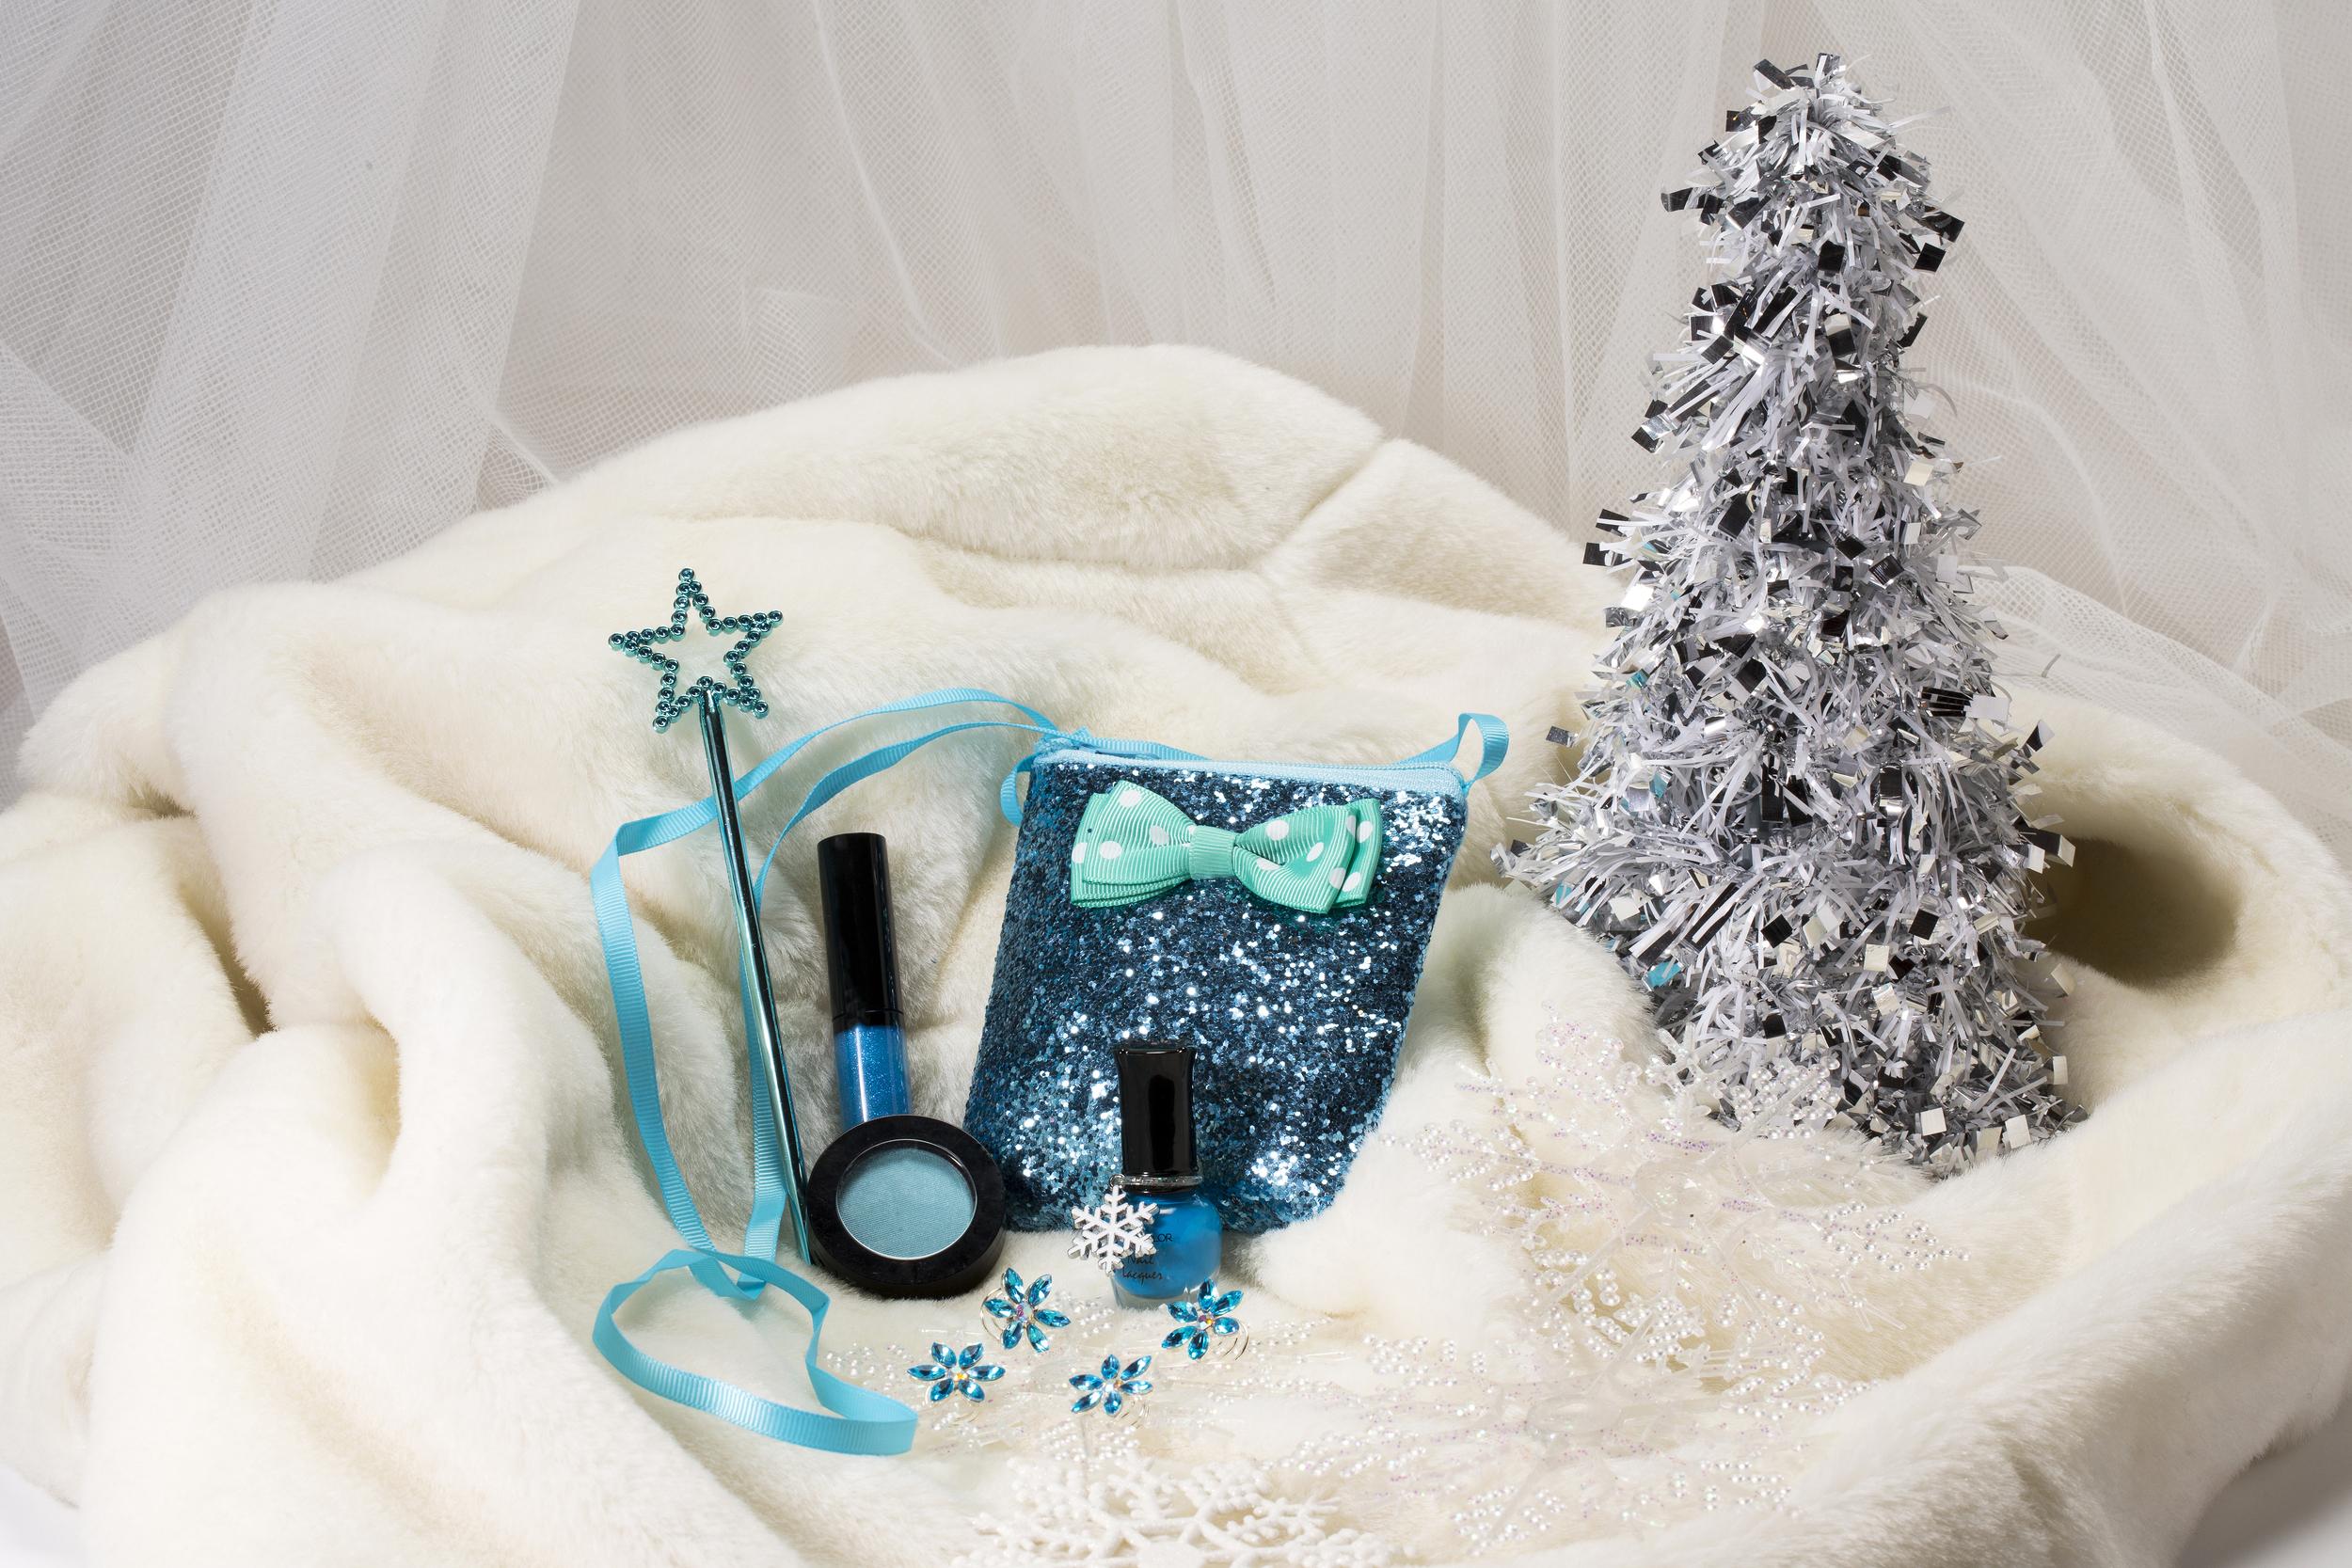 includes: blueberry lip gloss, blue eye shadow, mini blue nail polish, 4 blue snowflake hair crystals, snowflake charm, blue mini wand, blue sequin bag.